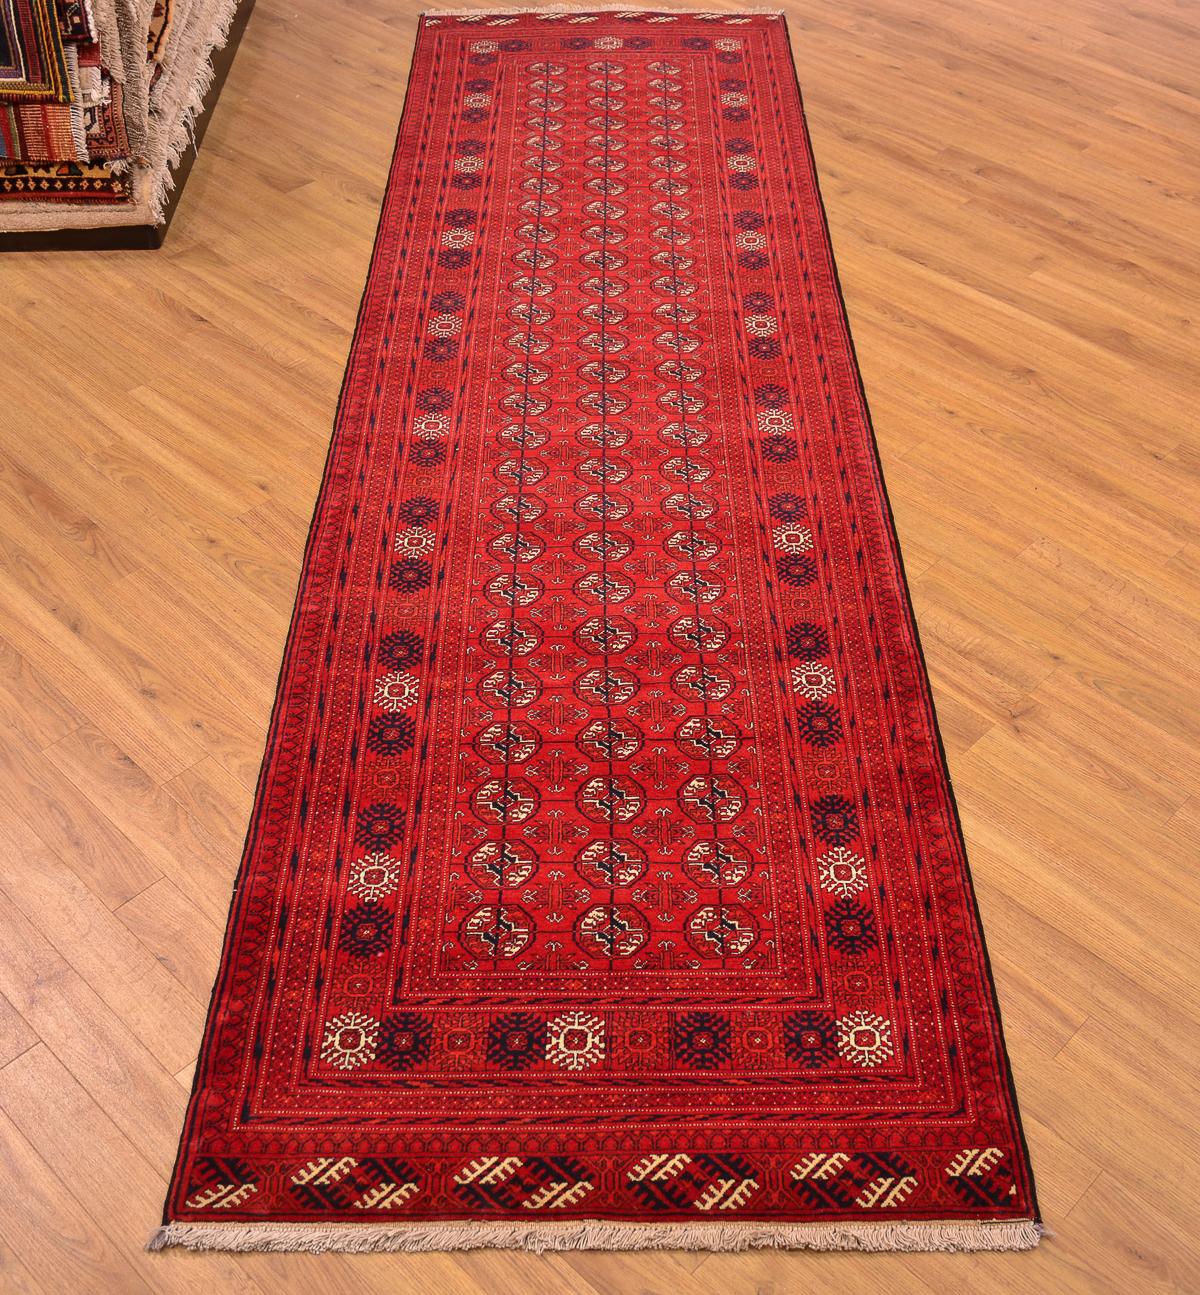 Fine Afghan Mauri Runner 3 06x0 87m The Oriental Rug